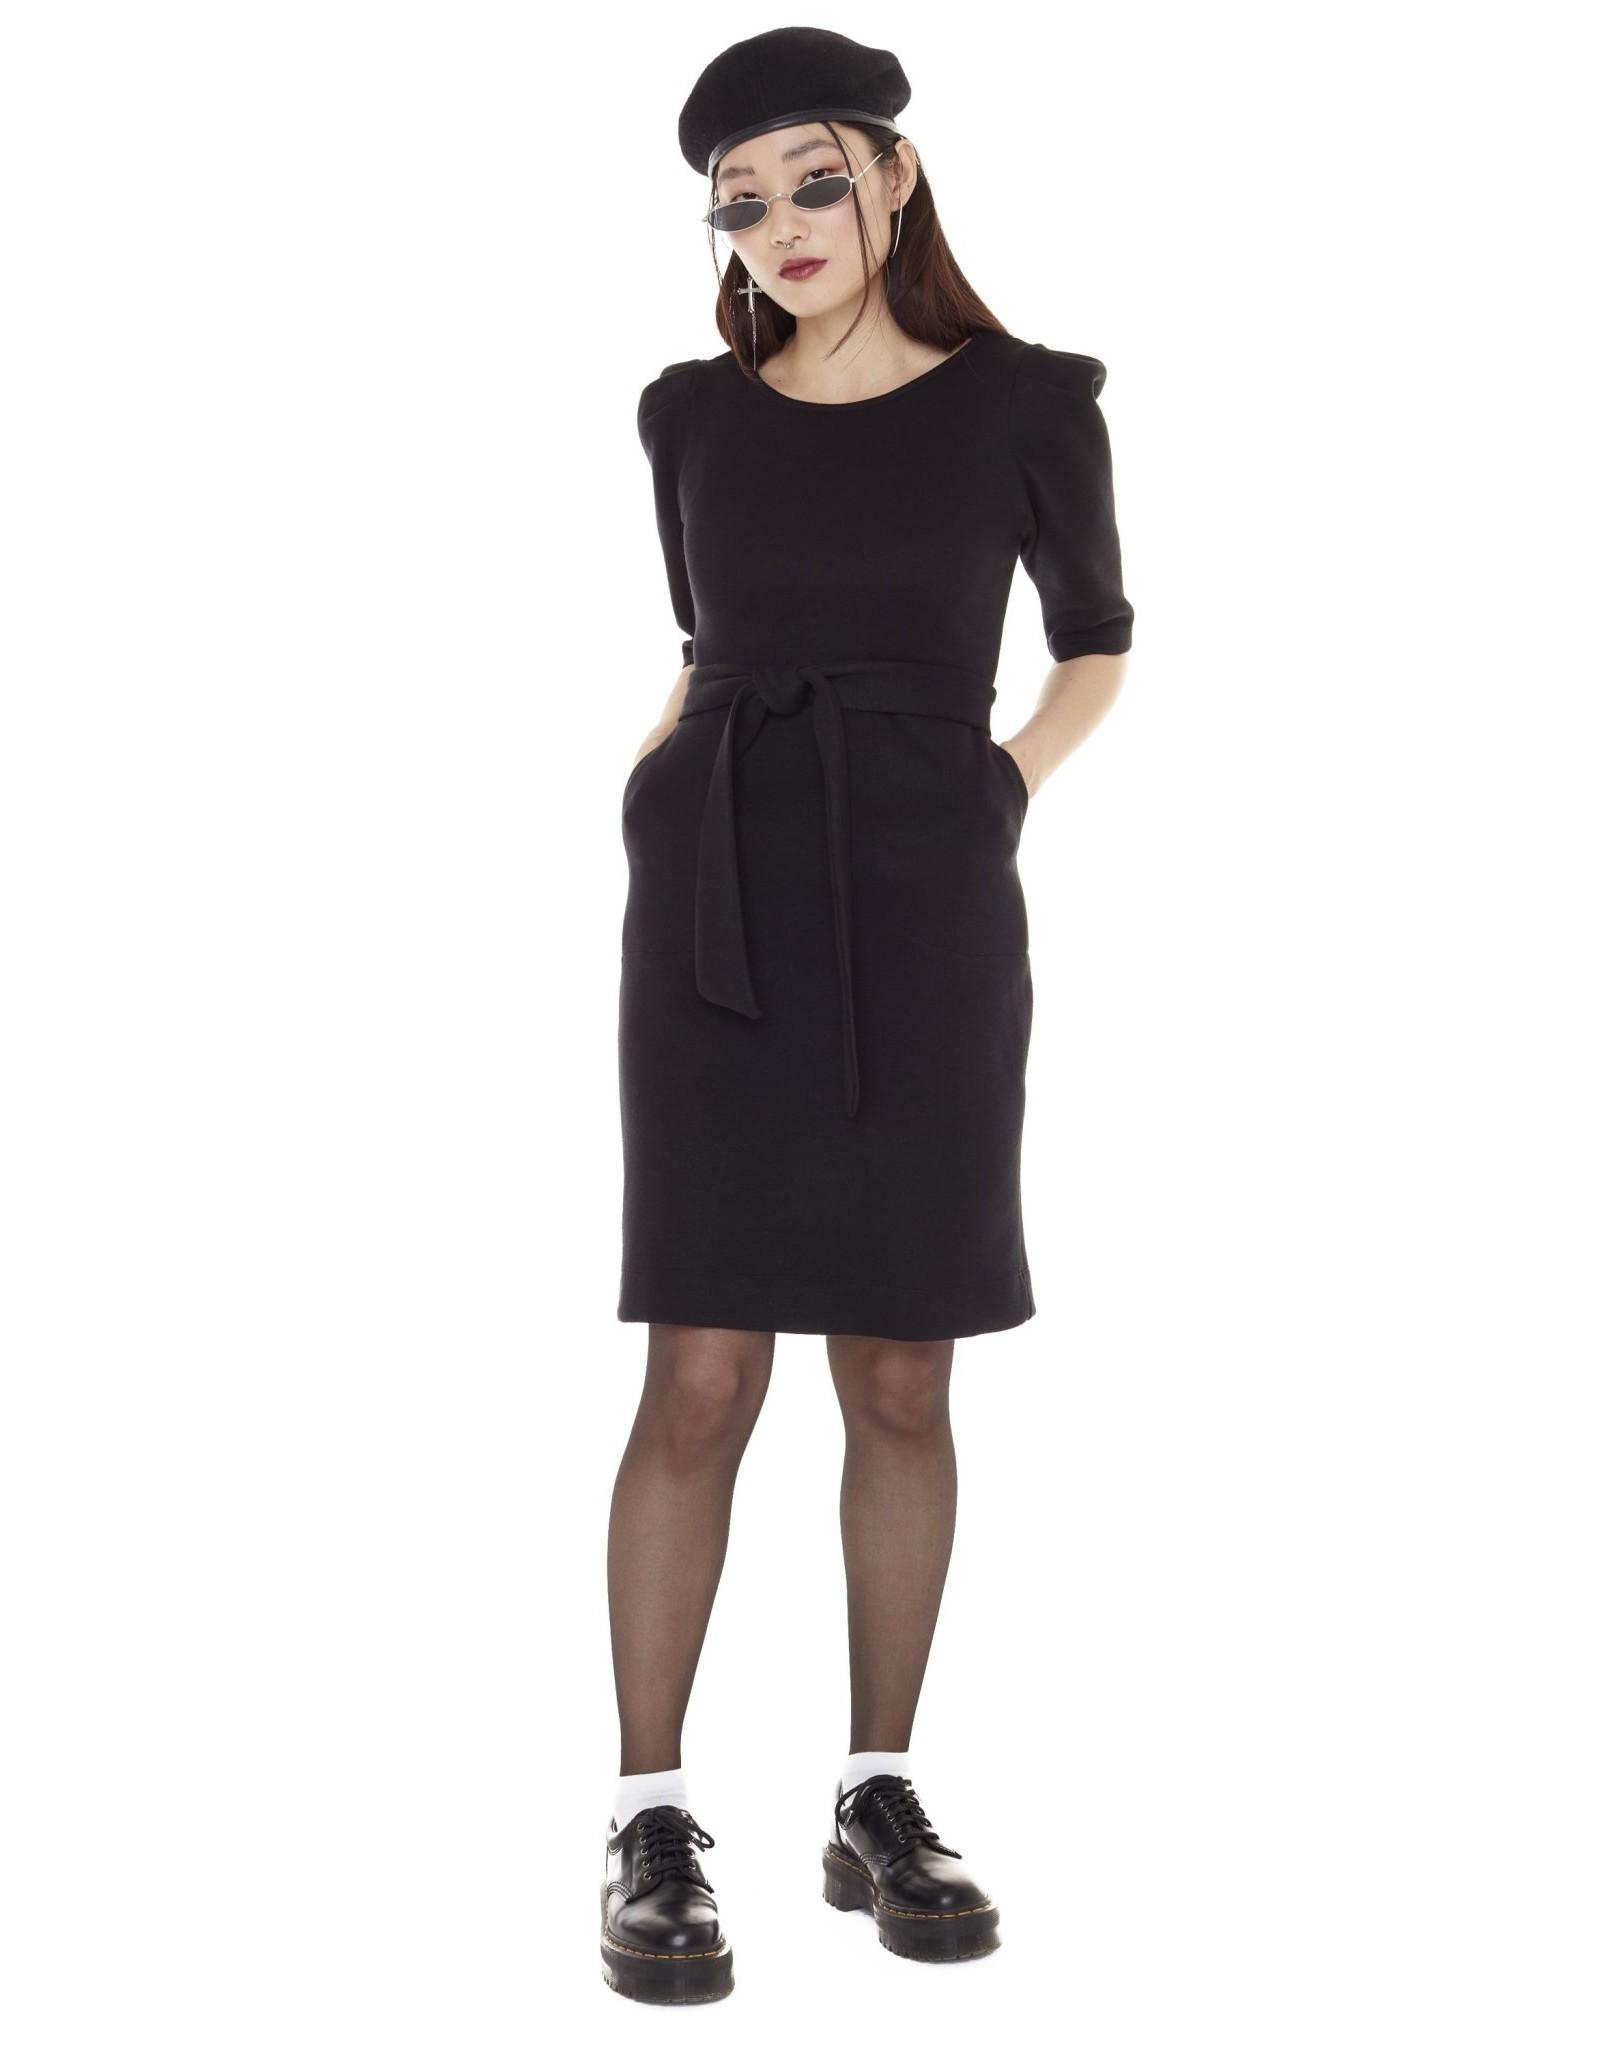 Annie 50 Fashion victim